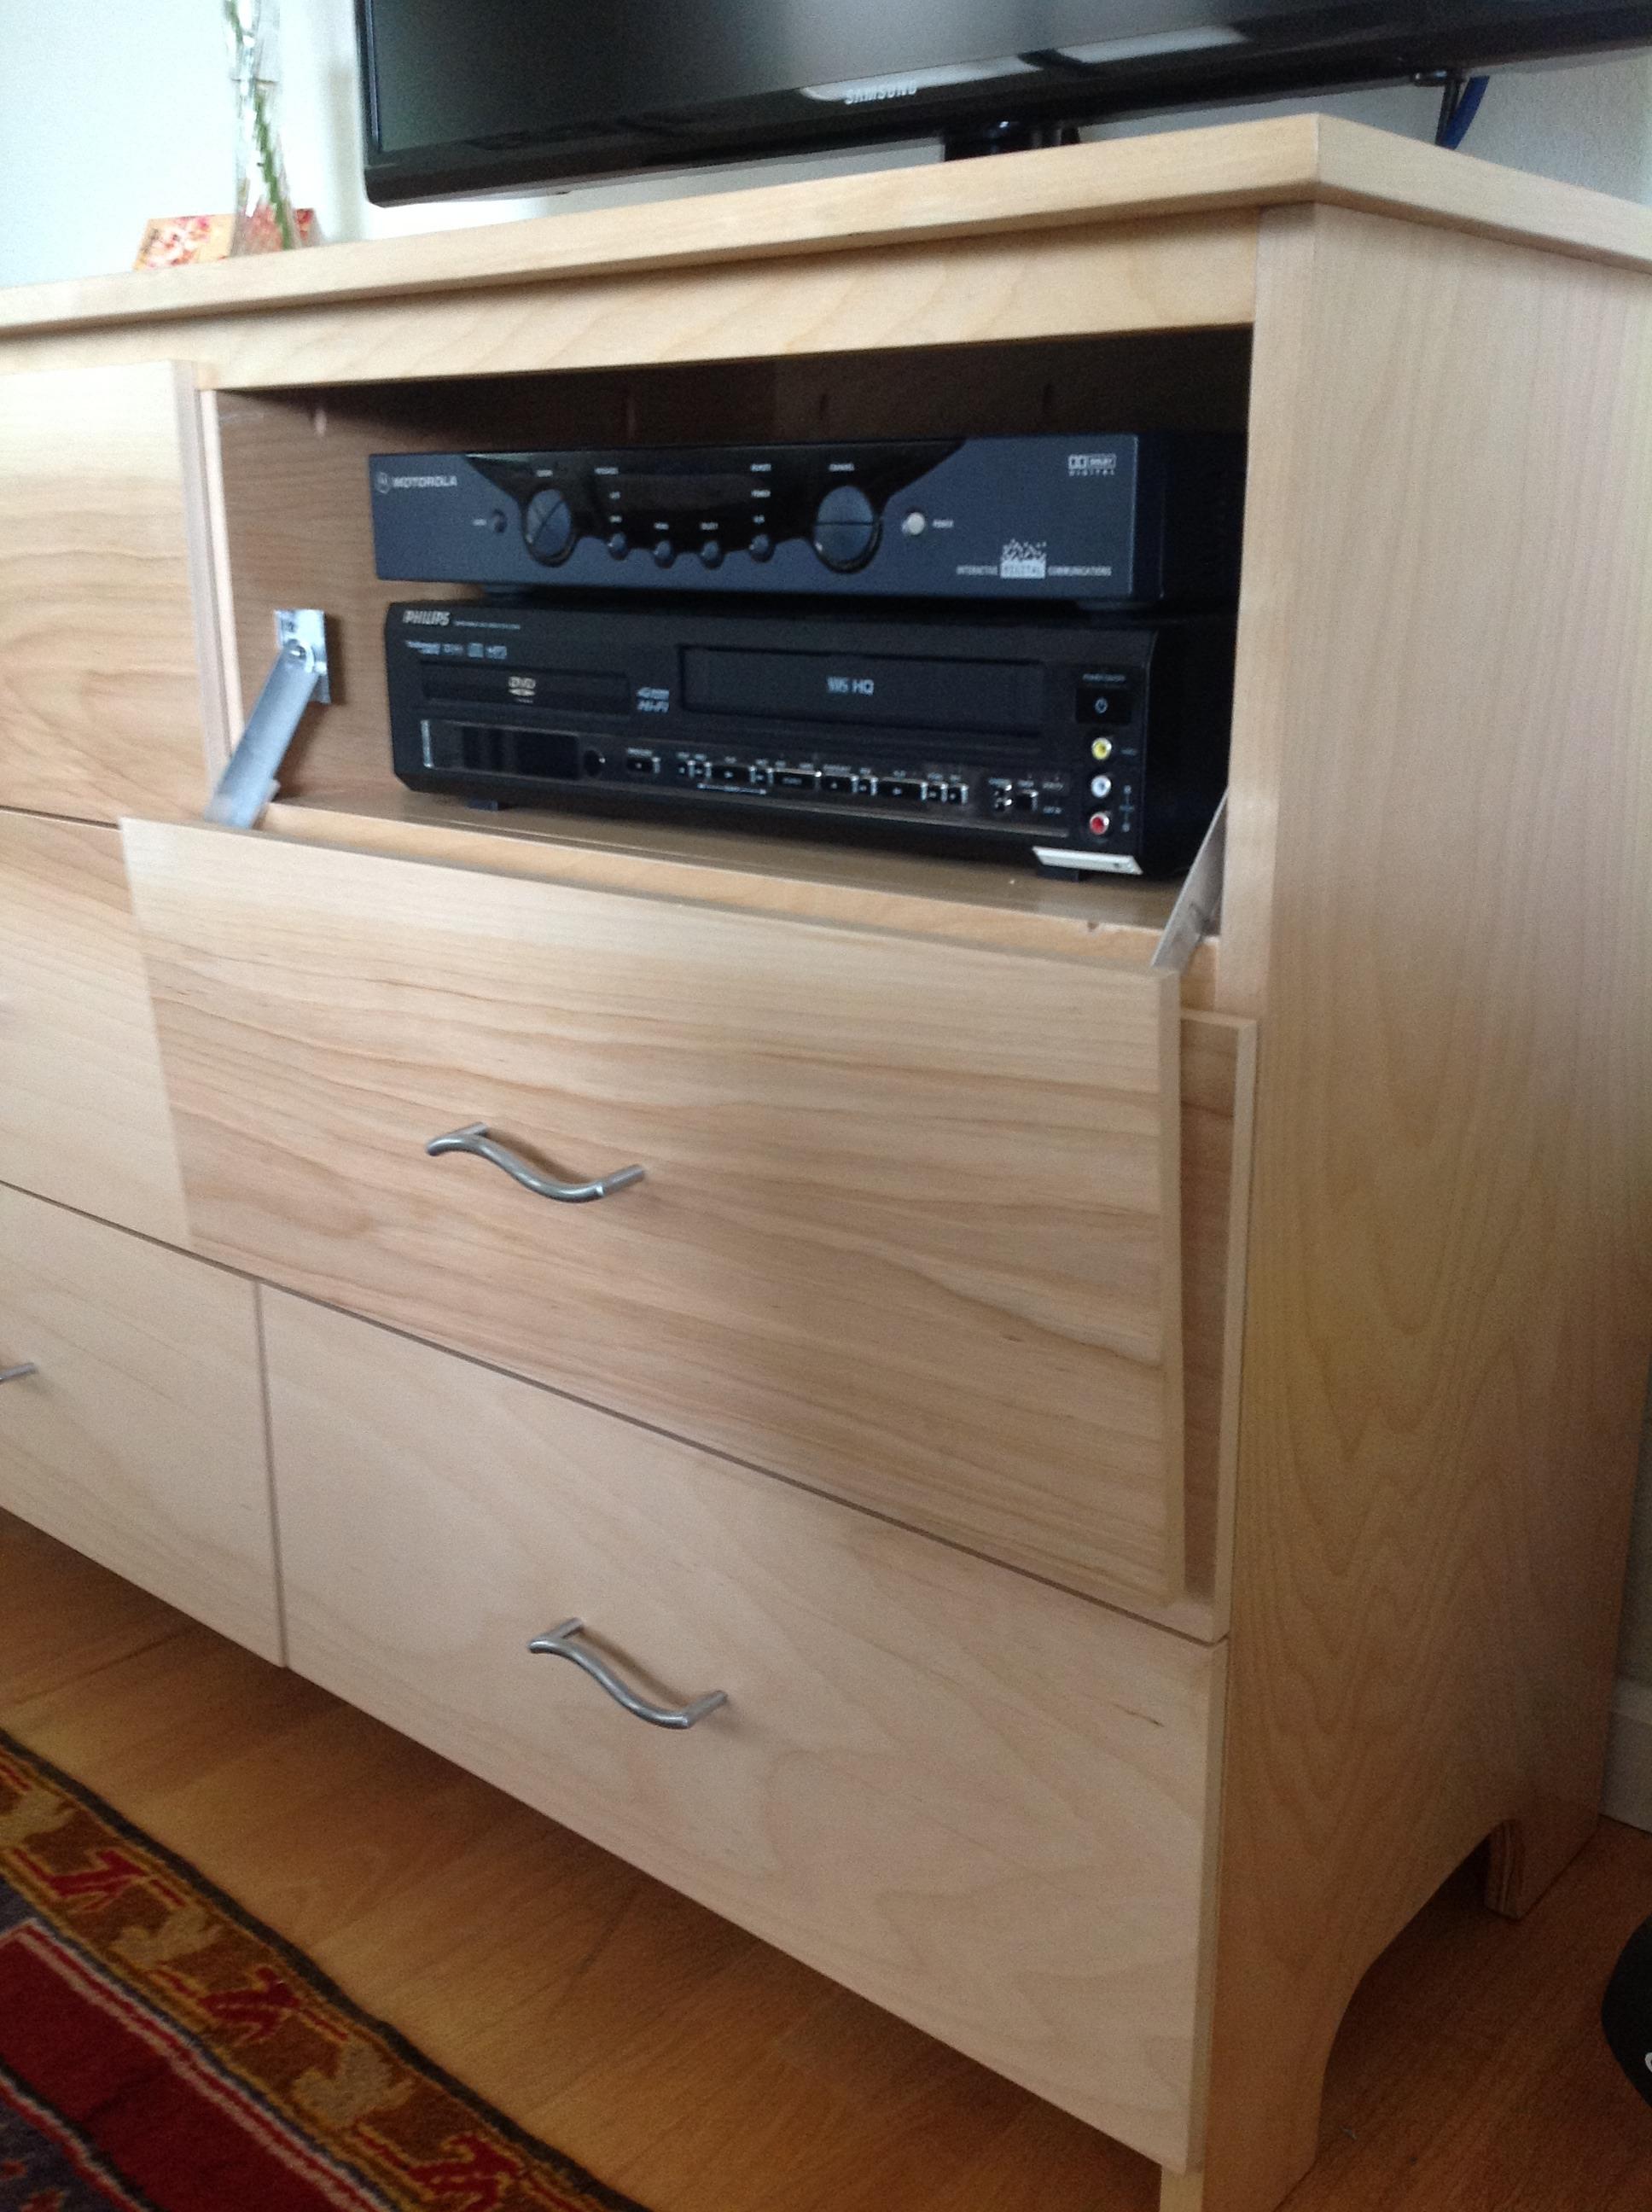 Convert a dresser drawer to an electonics bay with a drop-down door